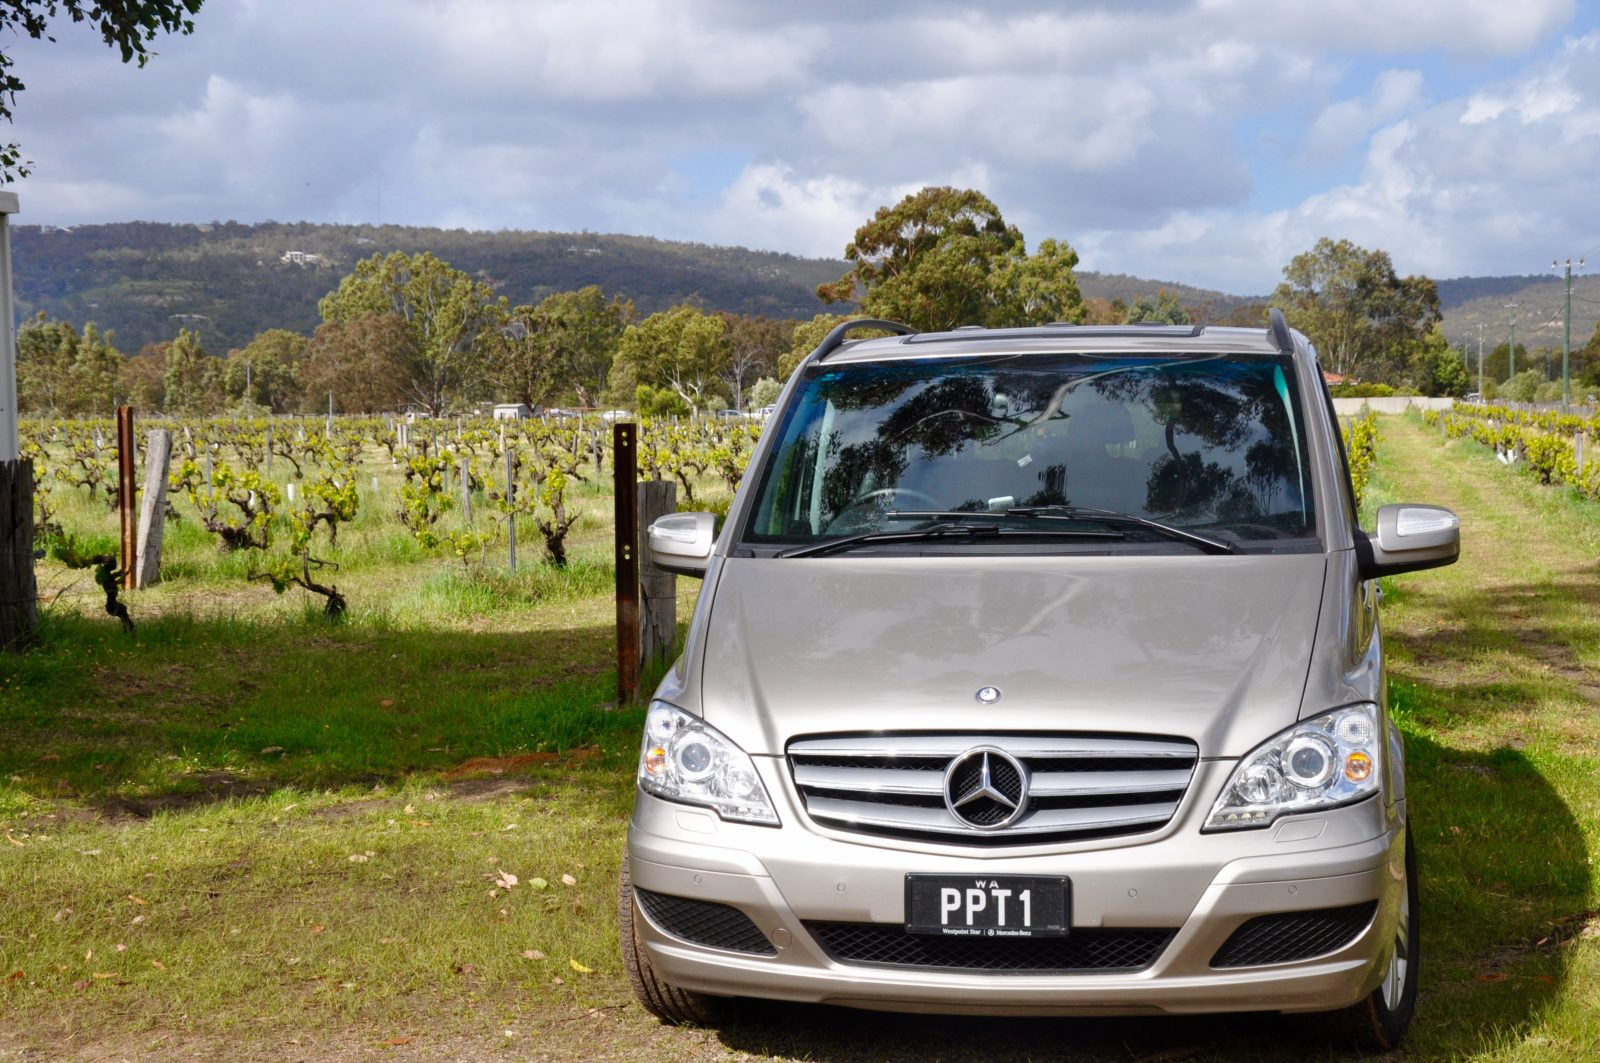 Perth Platinum Tours, Stirling, Western Australia